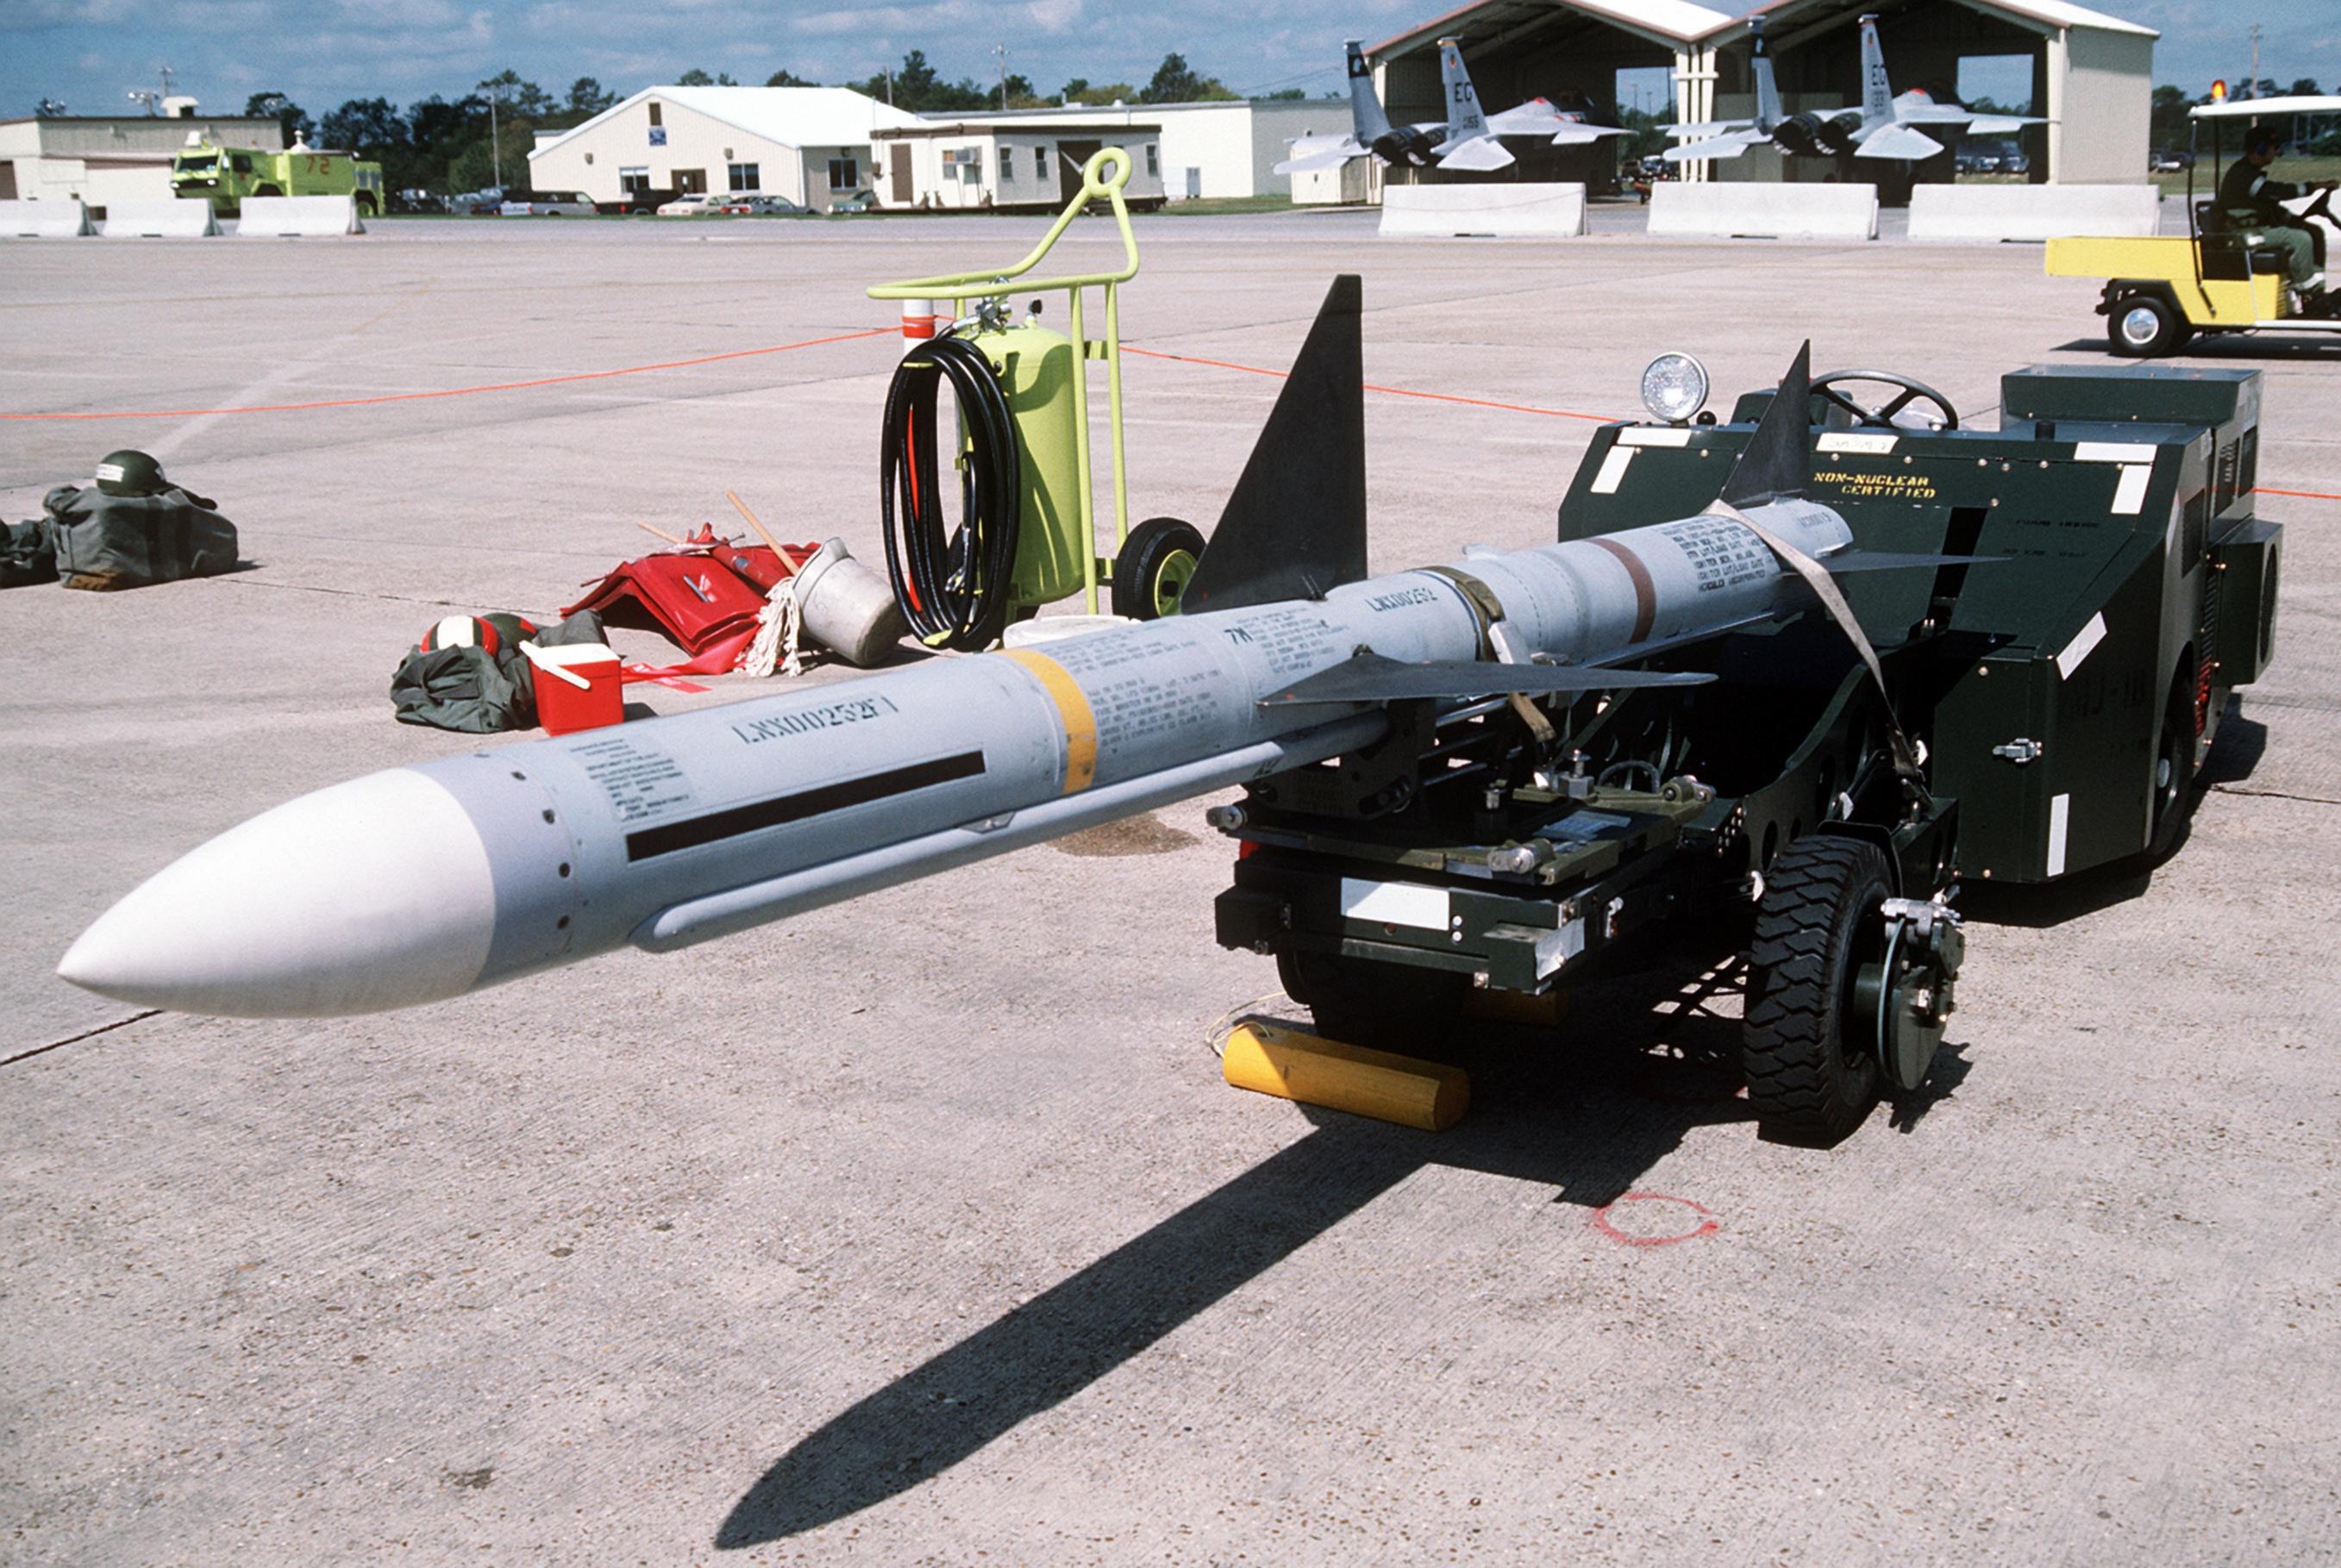 AIM-7_Sparrow_at_Eglin_AFB_1988.JPEG